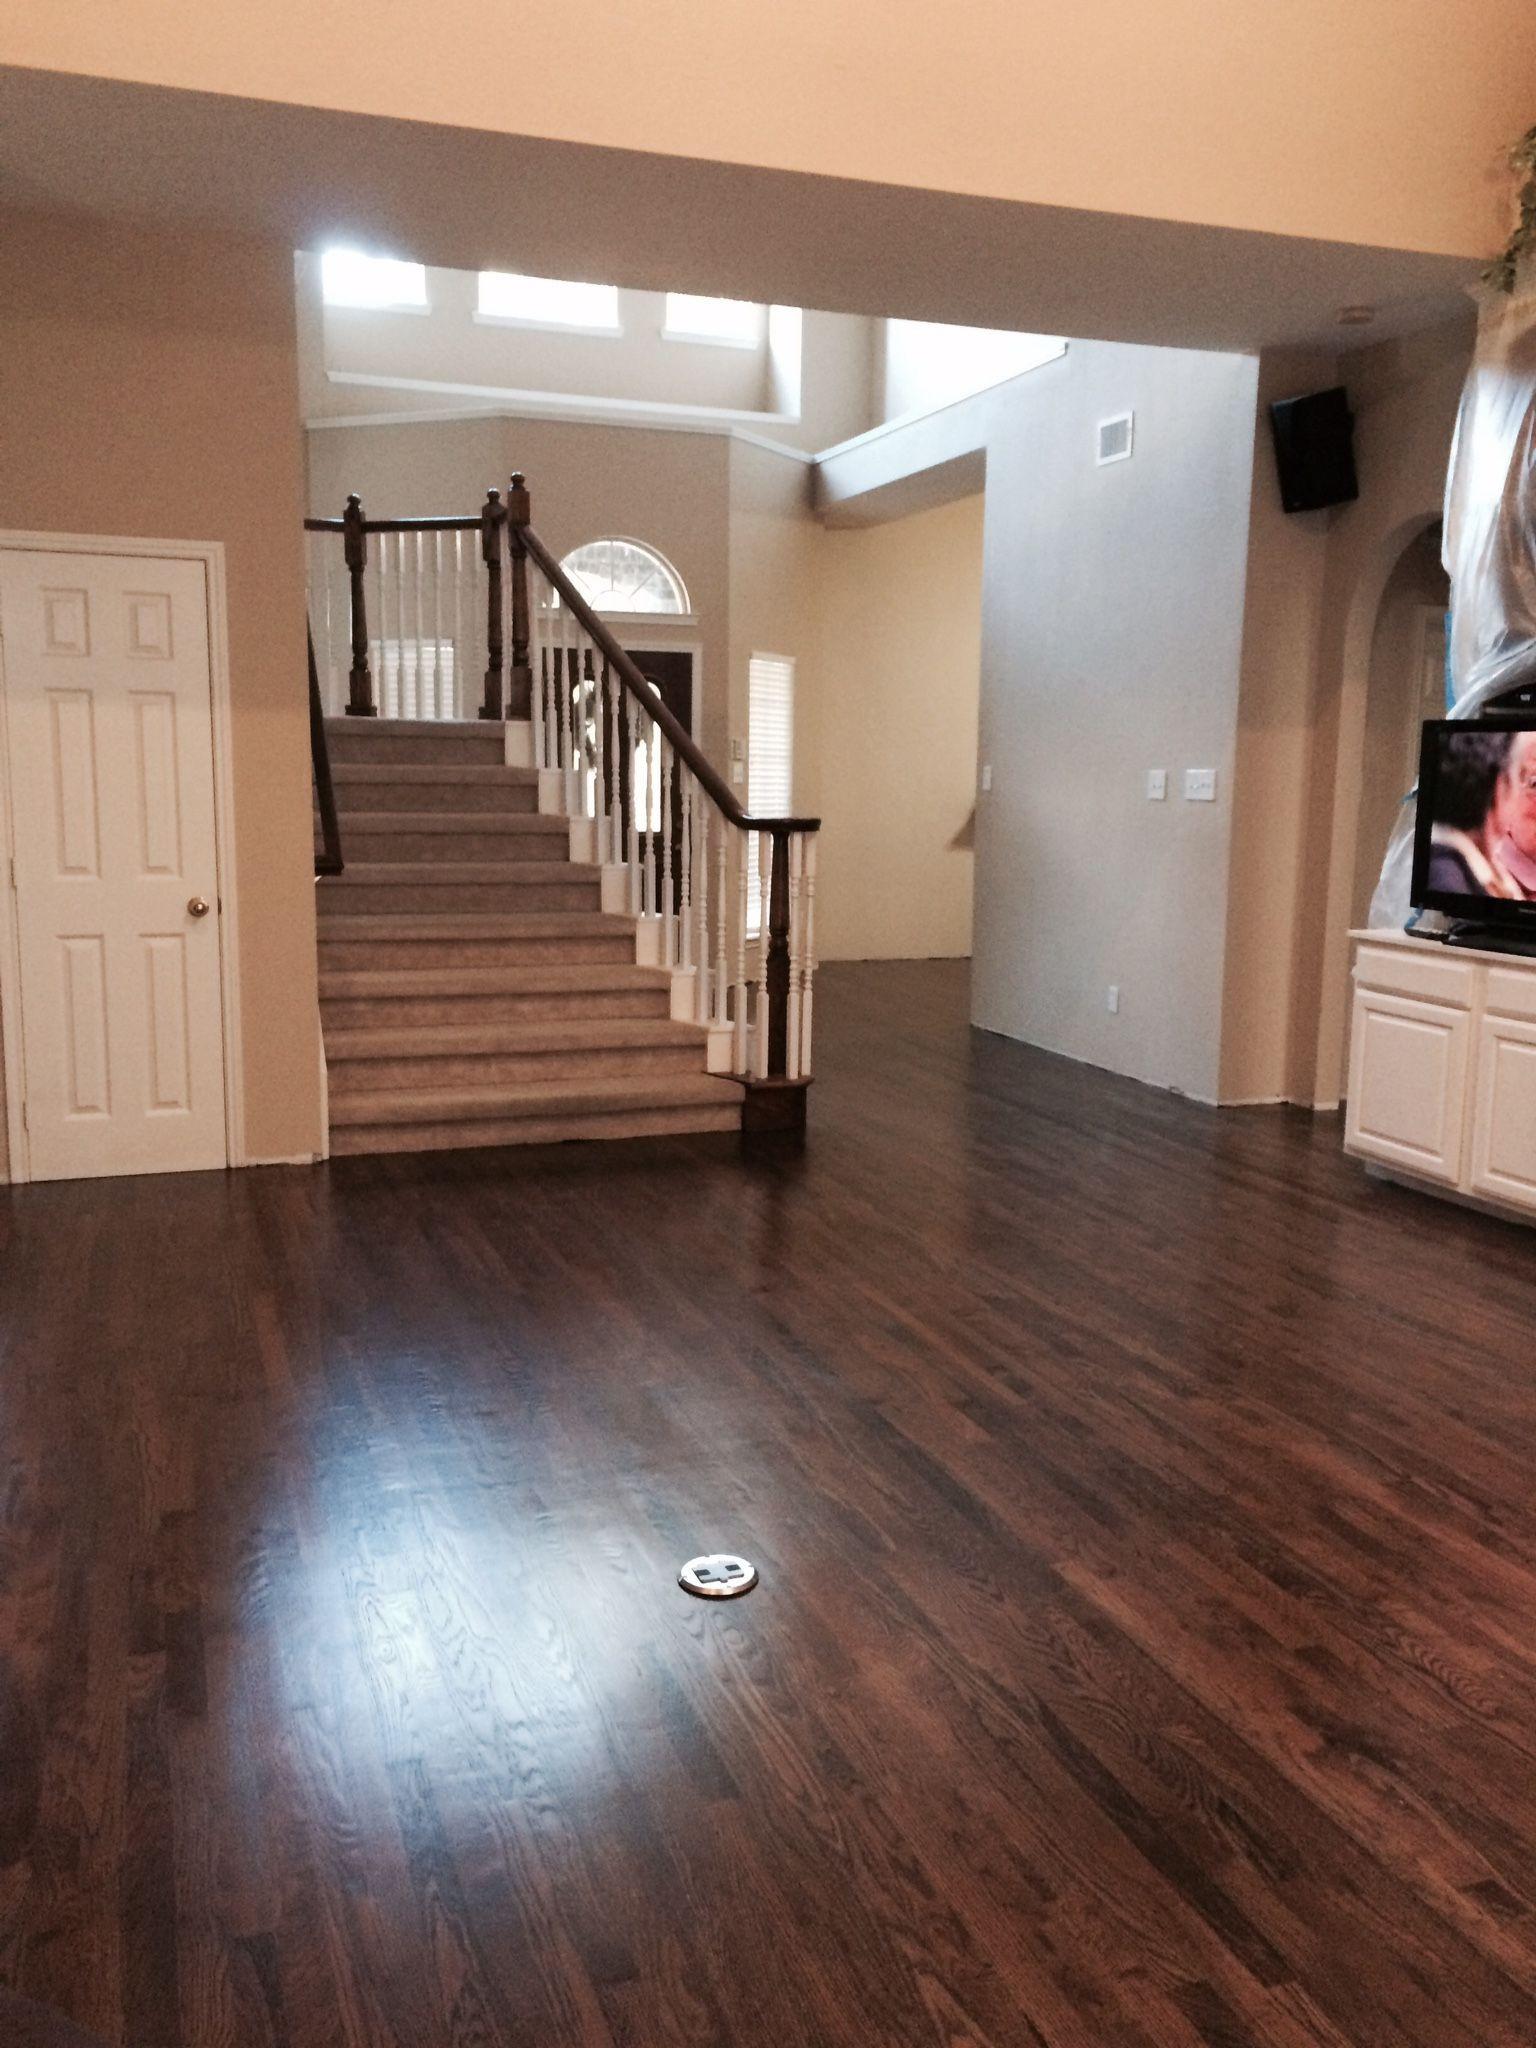 hardwood floor refinishing tulsa of dark walnut stain on white oak hardwood remodel 1floors in 2018 intended for dark walnut stain on white oak hardwood walnut hardwood flooring hardwood floor stain colors